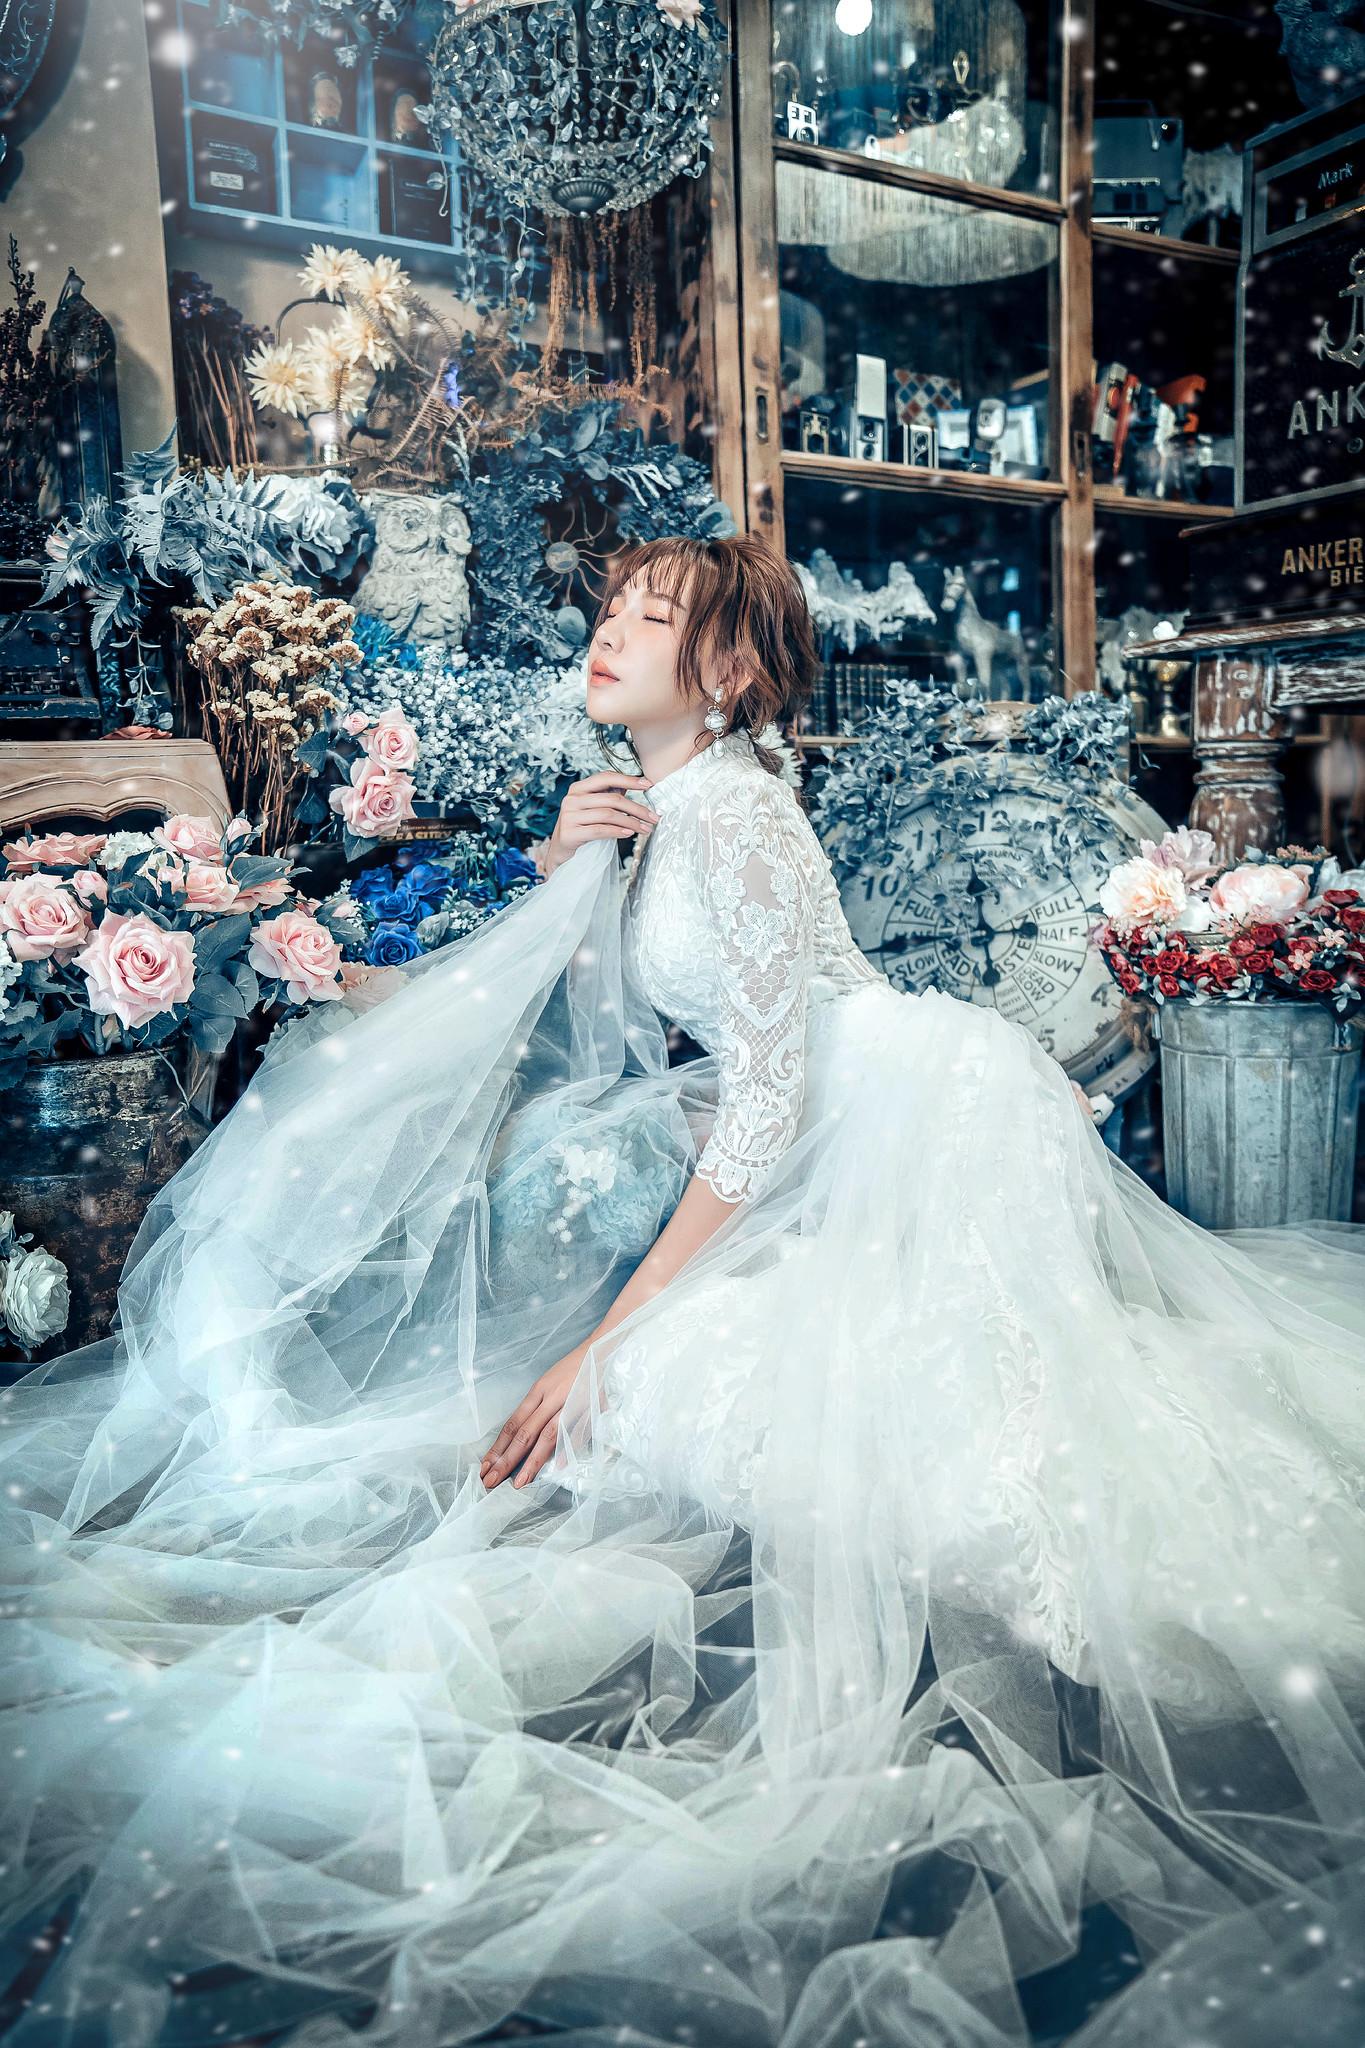 Wallpaper Dress Flowers Model Asian Women Indoors 1365x2048 Wallpapermaniac 1685993 Hd Wallpapers Wallhere